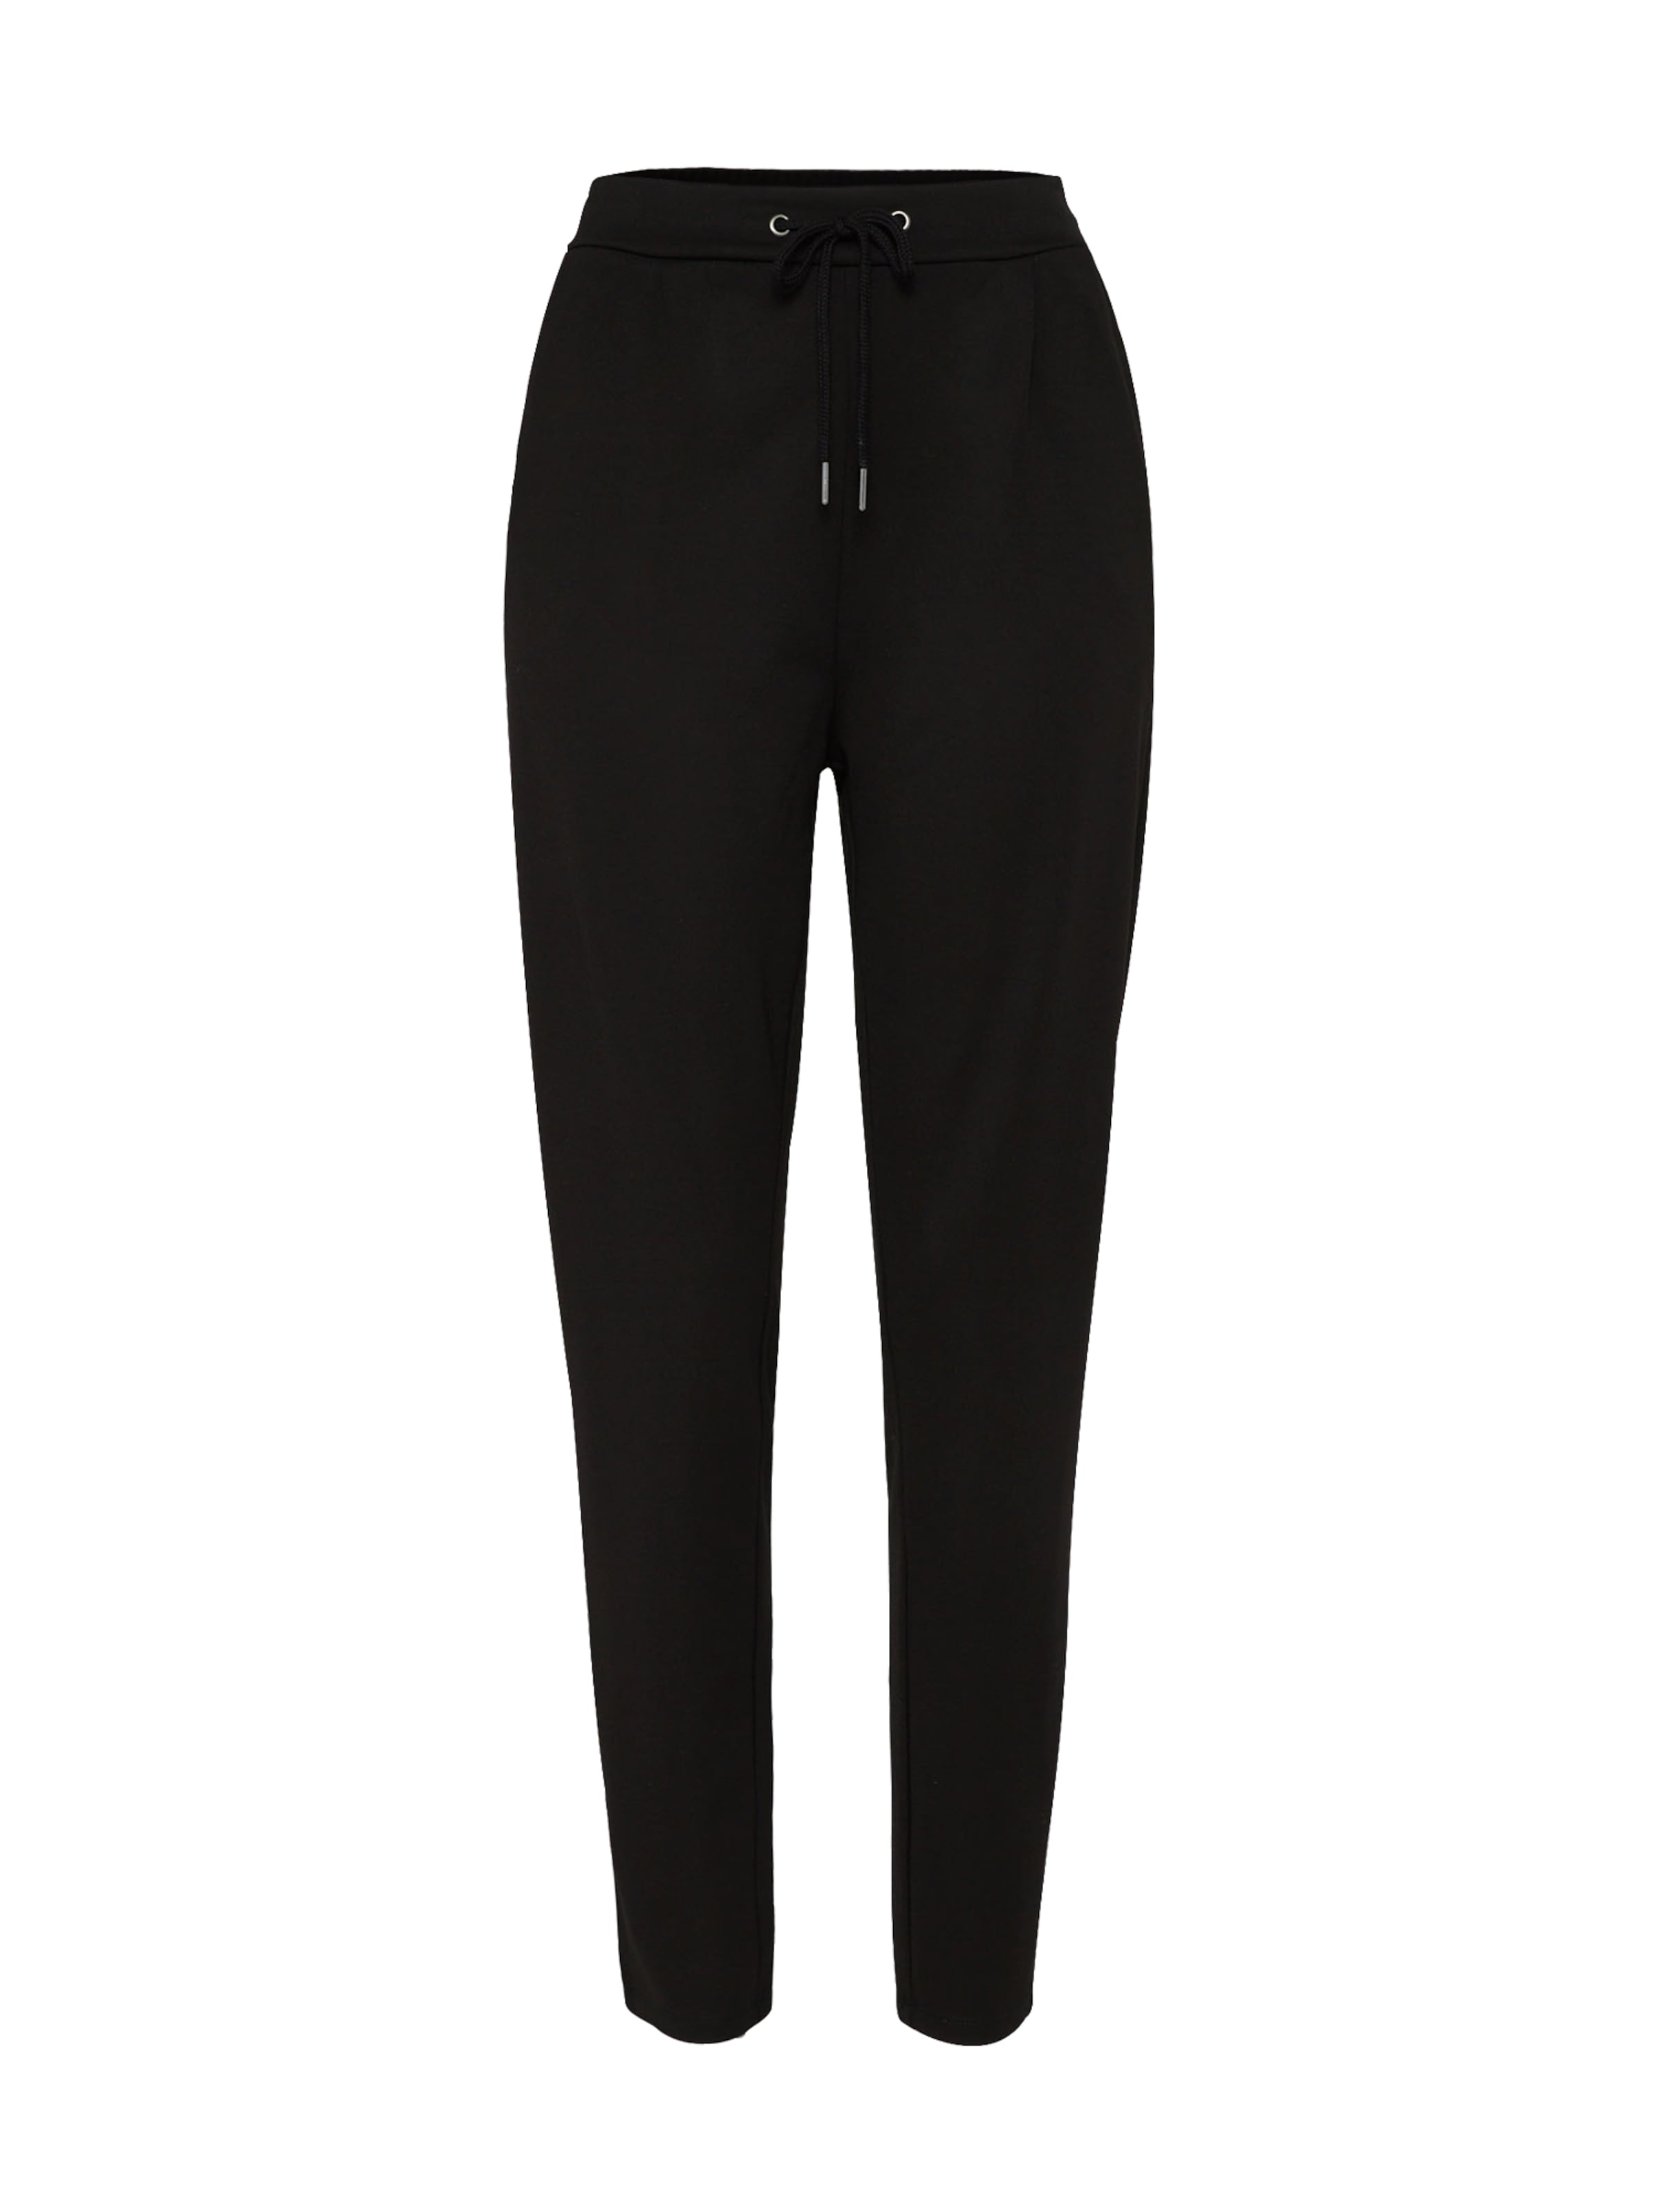 Vila À Pince 'class' Noir Pantalon En H9eWE2IDY